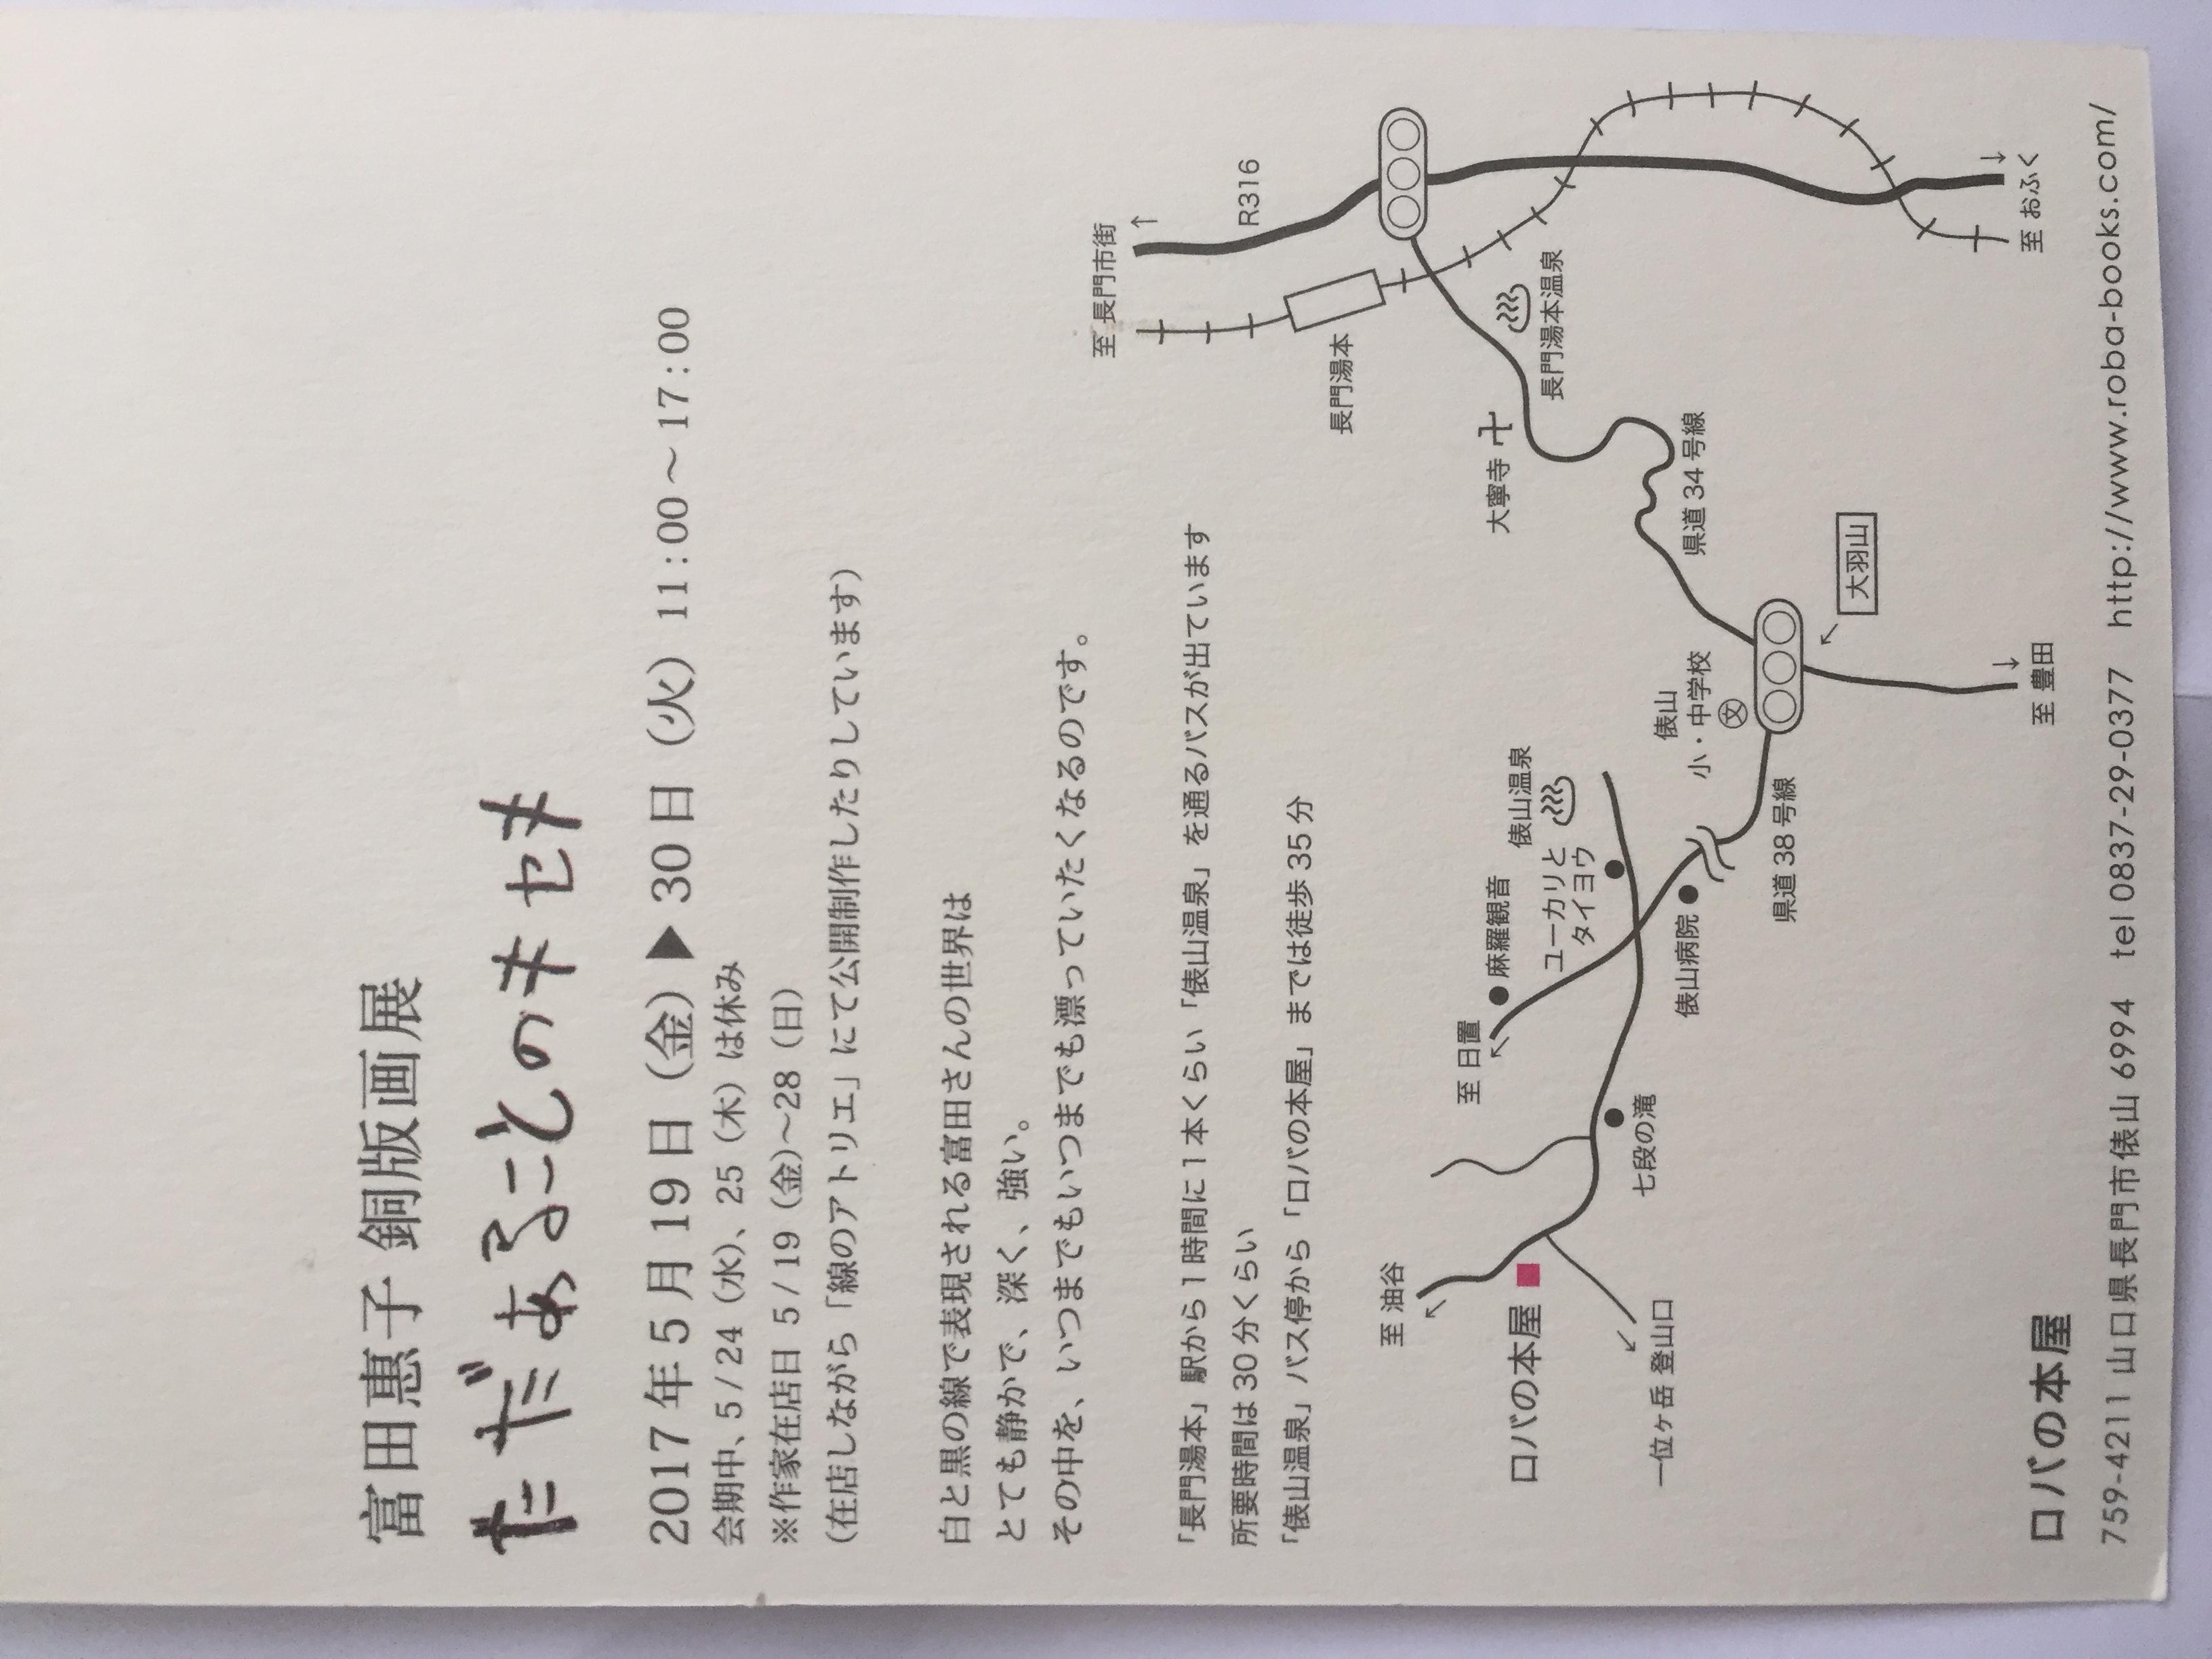 http://tomitakeiko.com/blog/2017/05/09/img03/IMG_2761.JPG